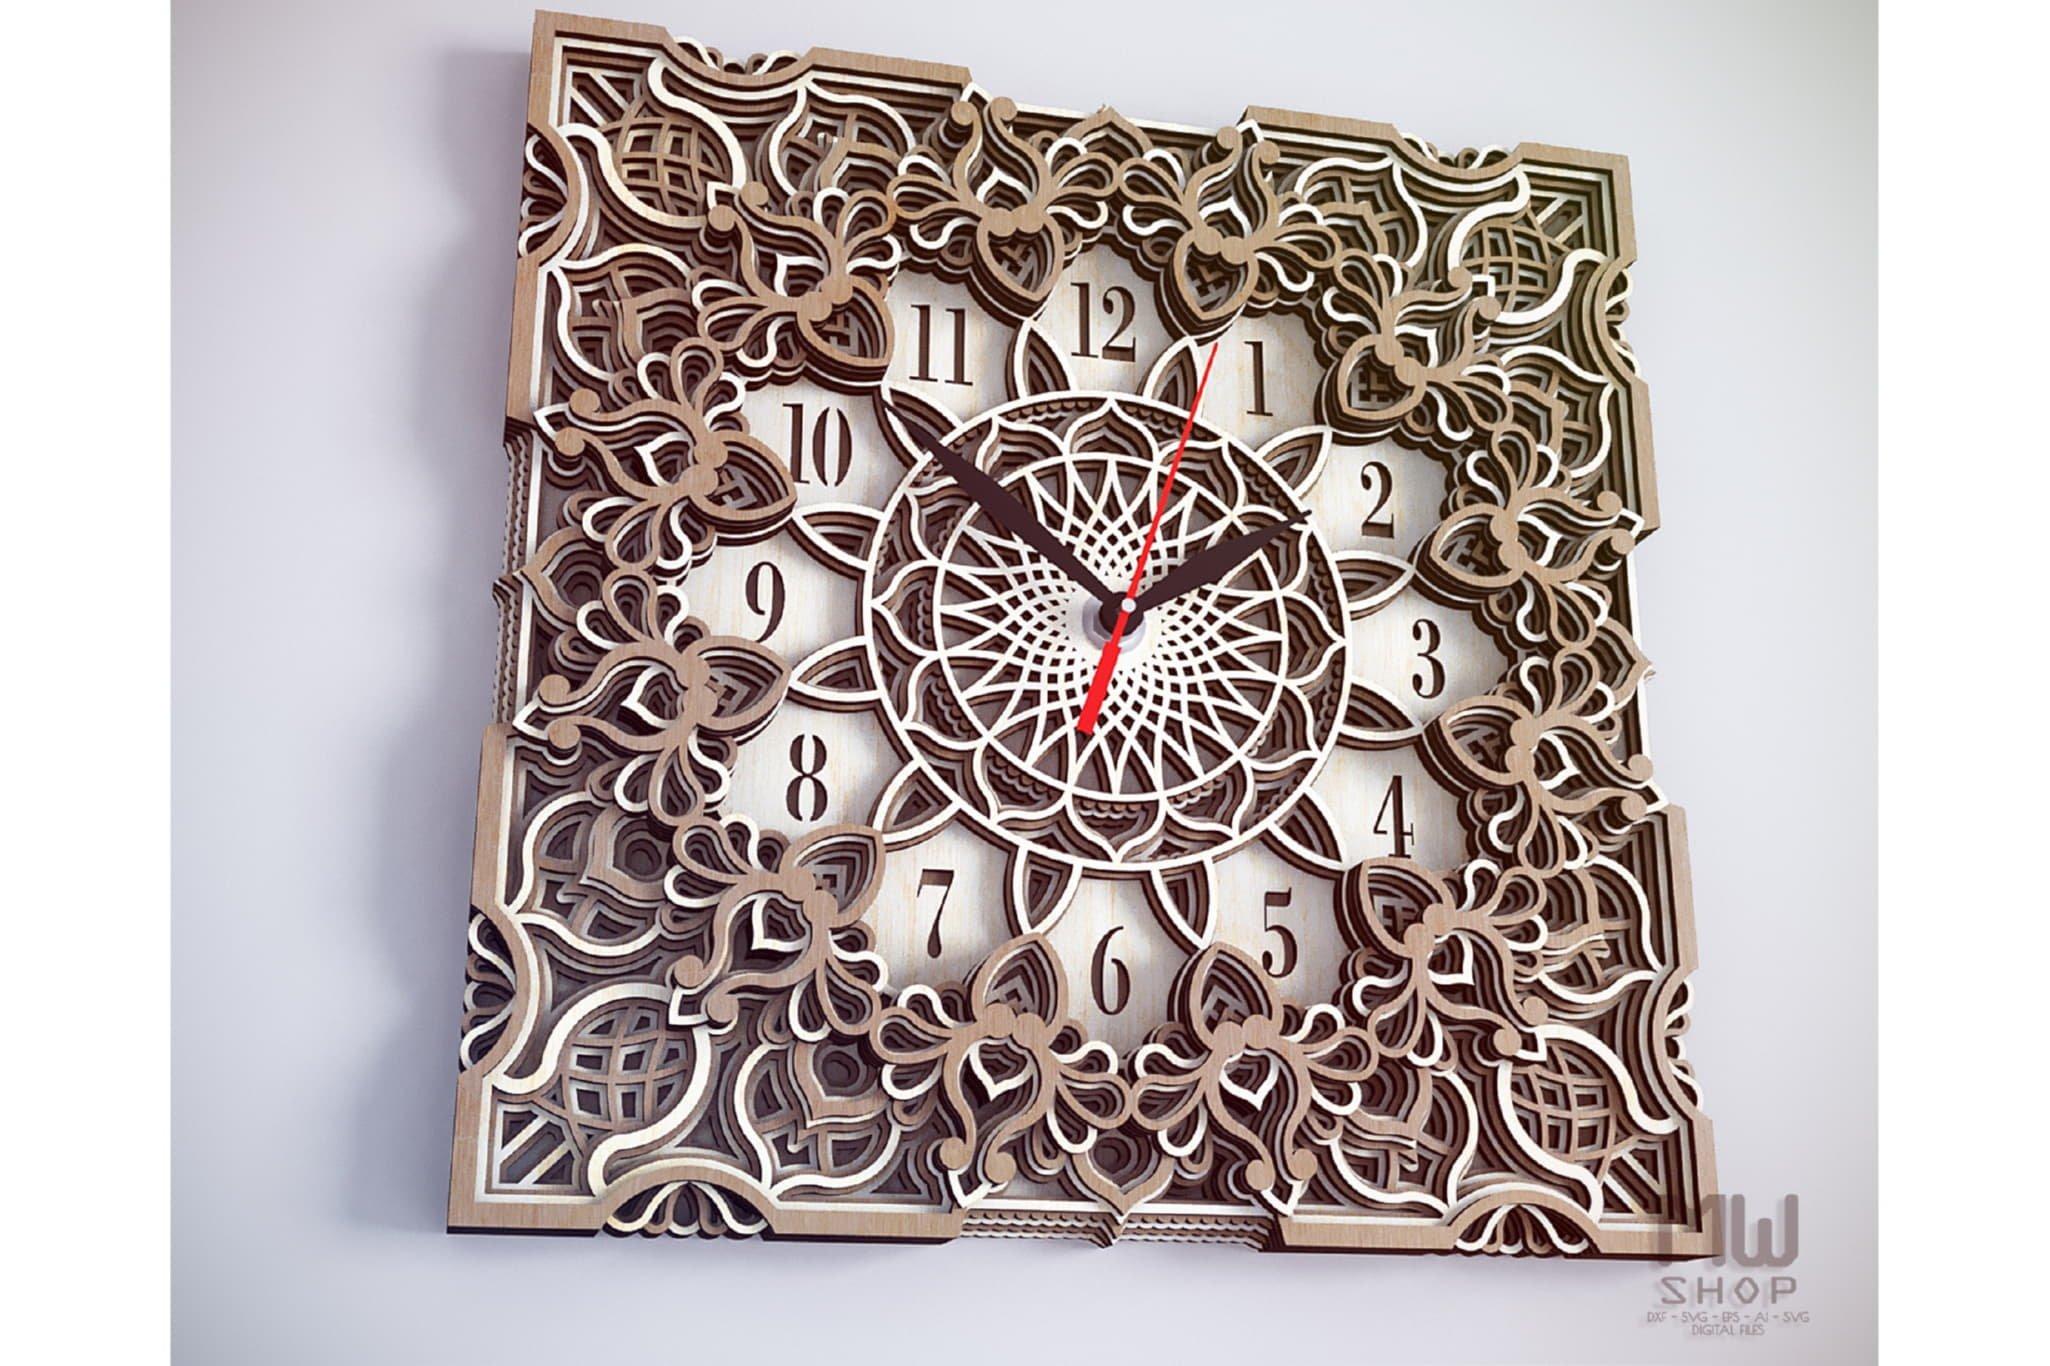 C13 - Mandala Clock DXF for Laser cut, Sacred Clock SVG example image 3